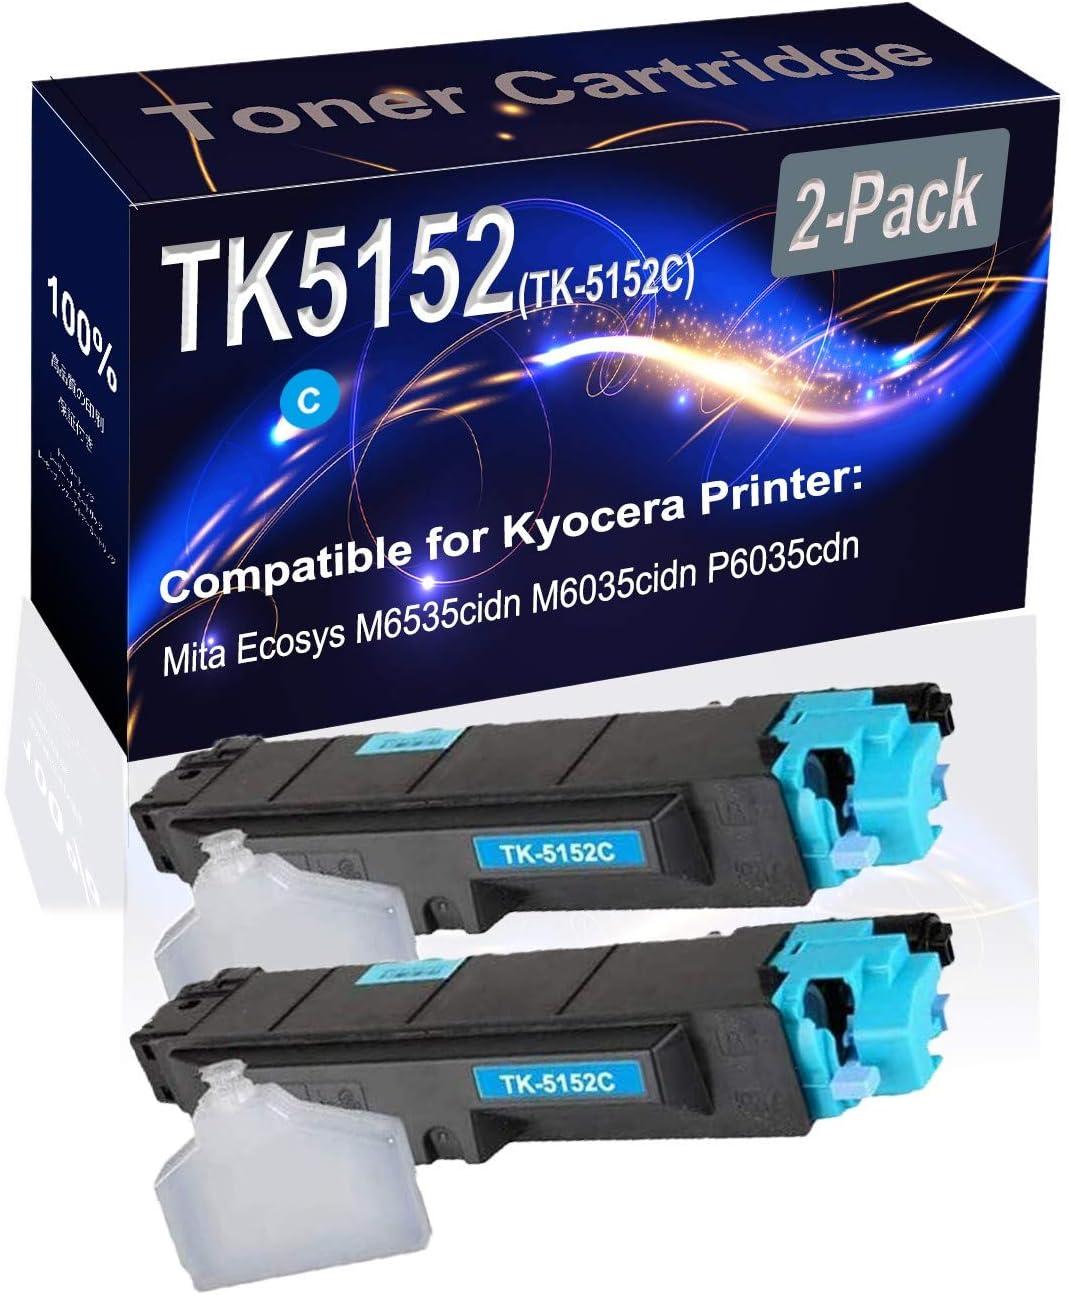 2-Pack (Cyan) Compatible Mita Ecosys M6535cidn M6035cidn P6035cdn Laser Printer Toner Cartridge (High Capacity) Replacement for Kyocera TK5152 (TK-5152C) Printer Toner Cartridge